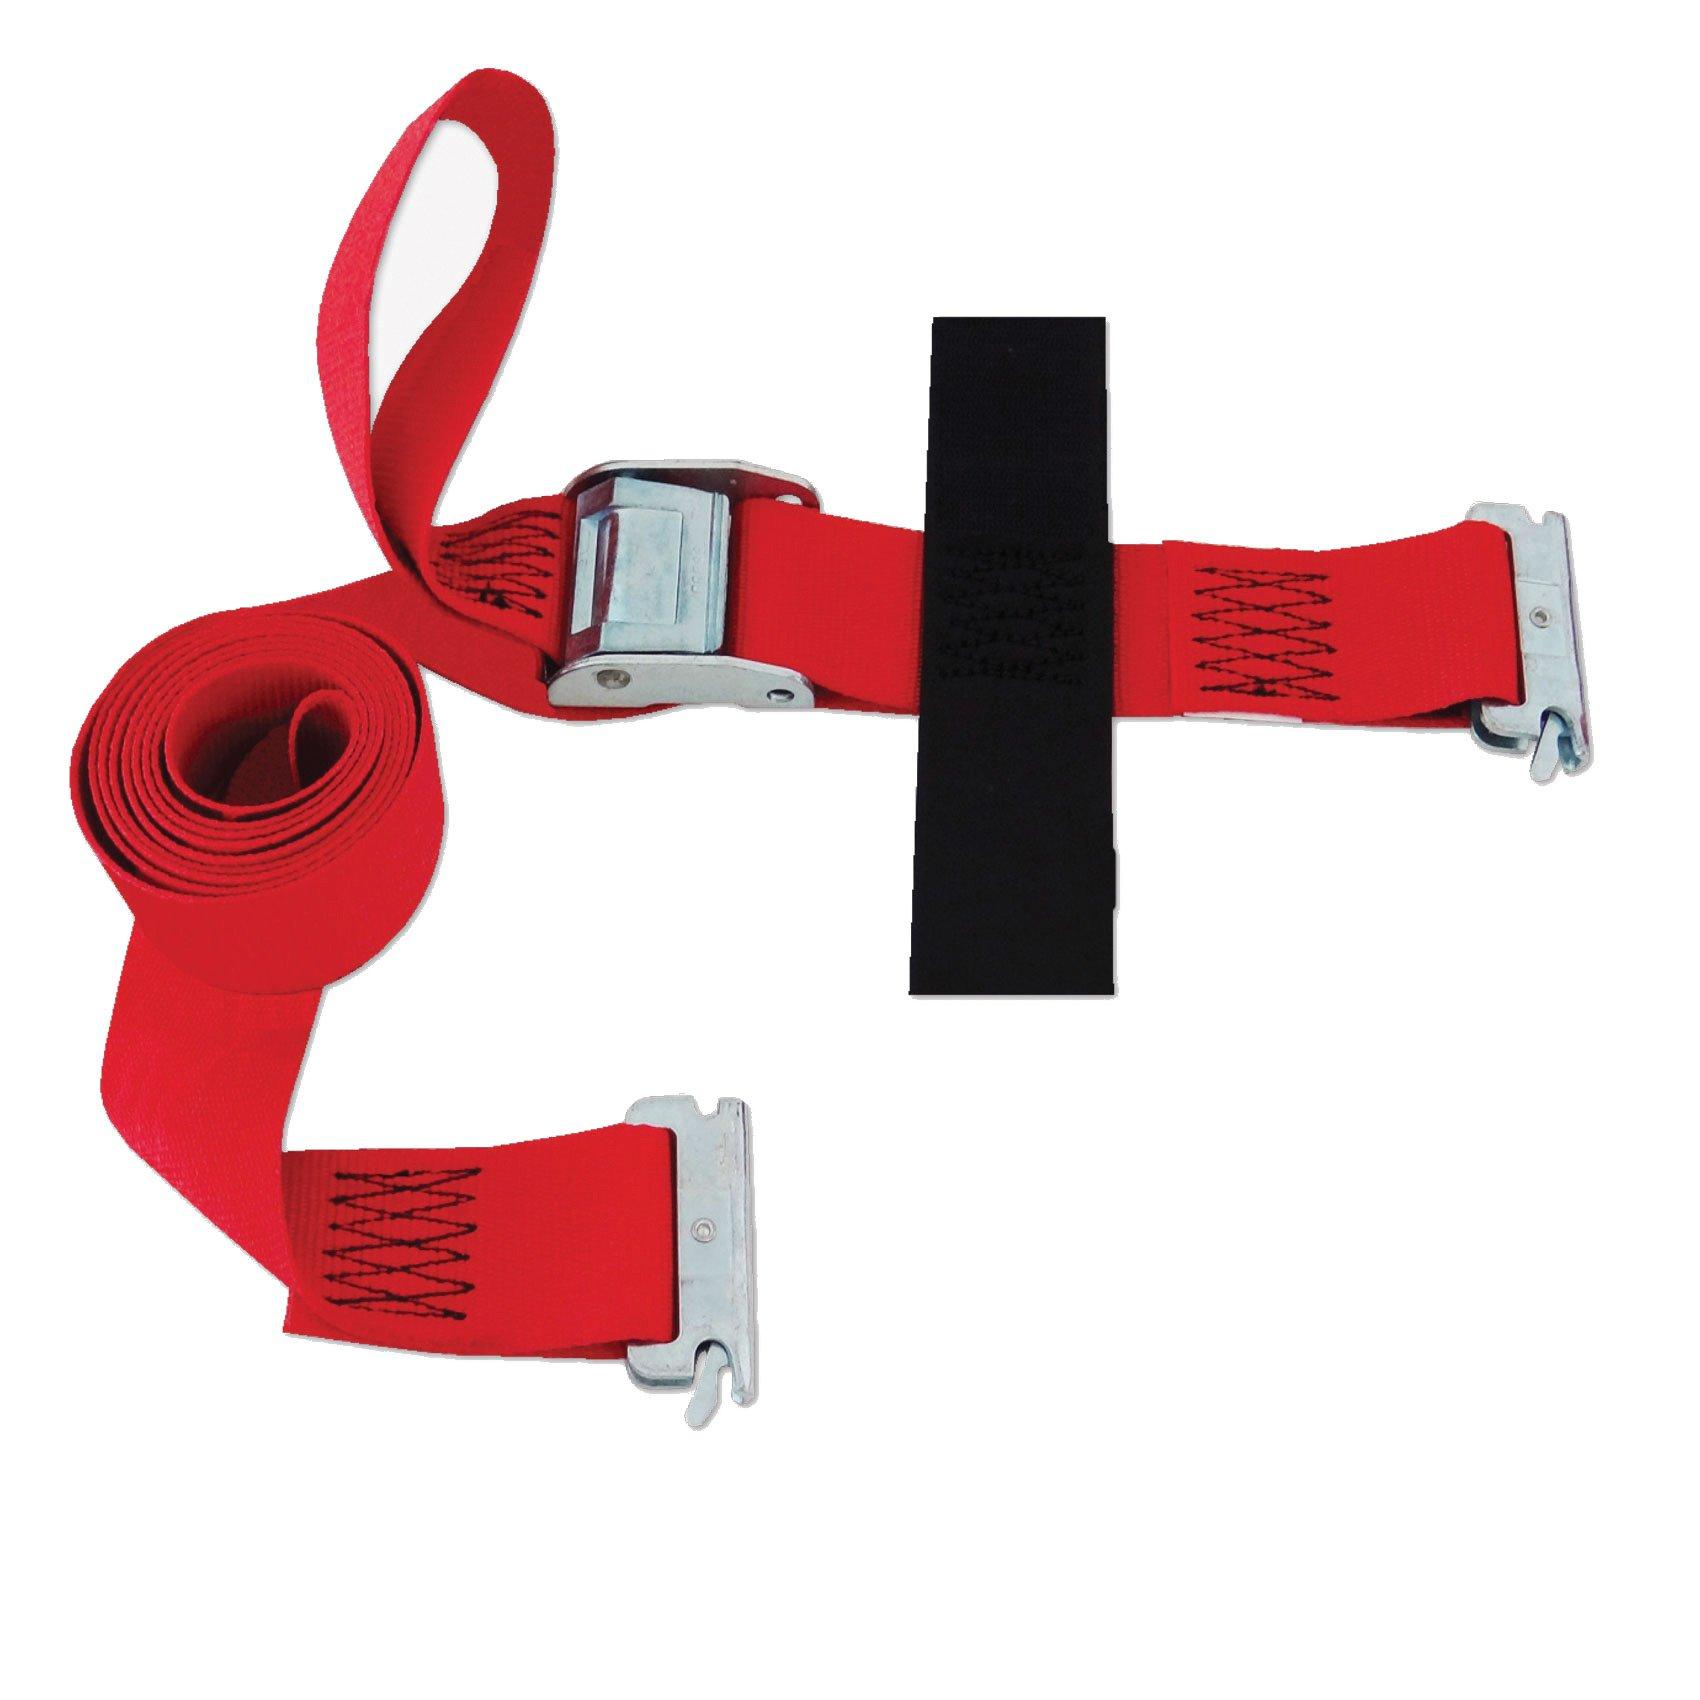 SNAPLOCS E-STRAP 2''x8' CAM (USA!) with Hook & Loop storage fastener